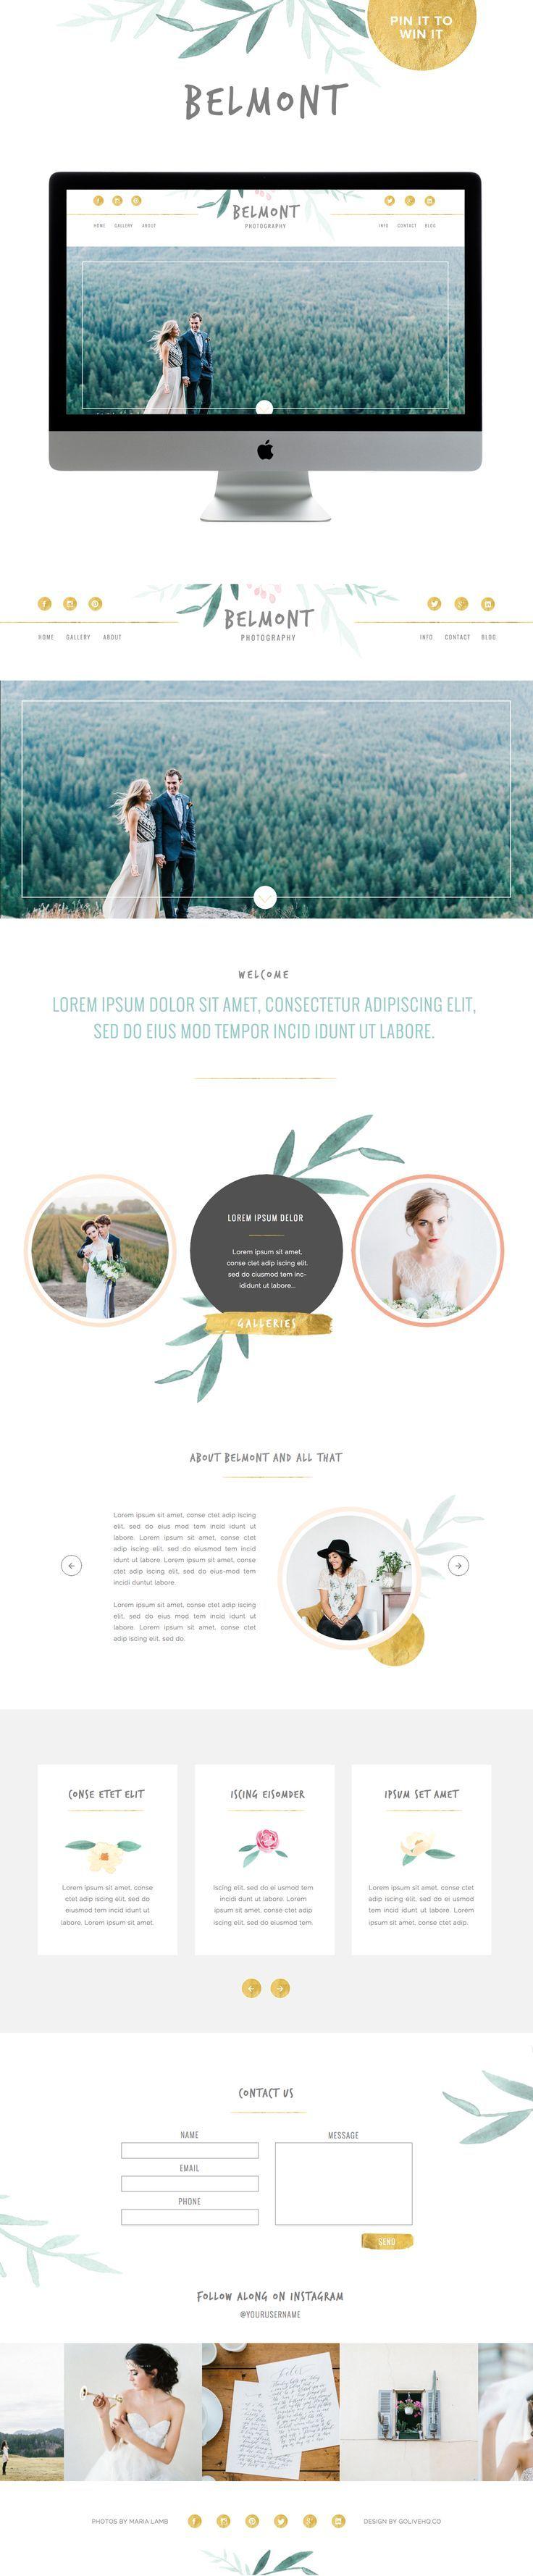 clean website design   Great Design   Pinterest   Website designs ...